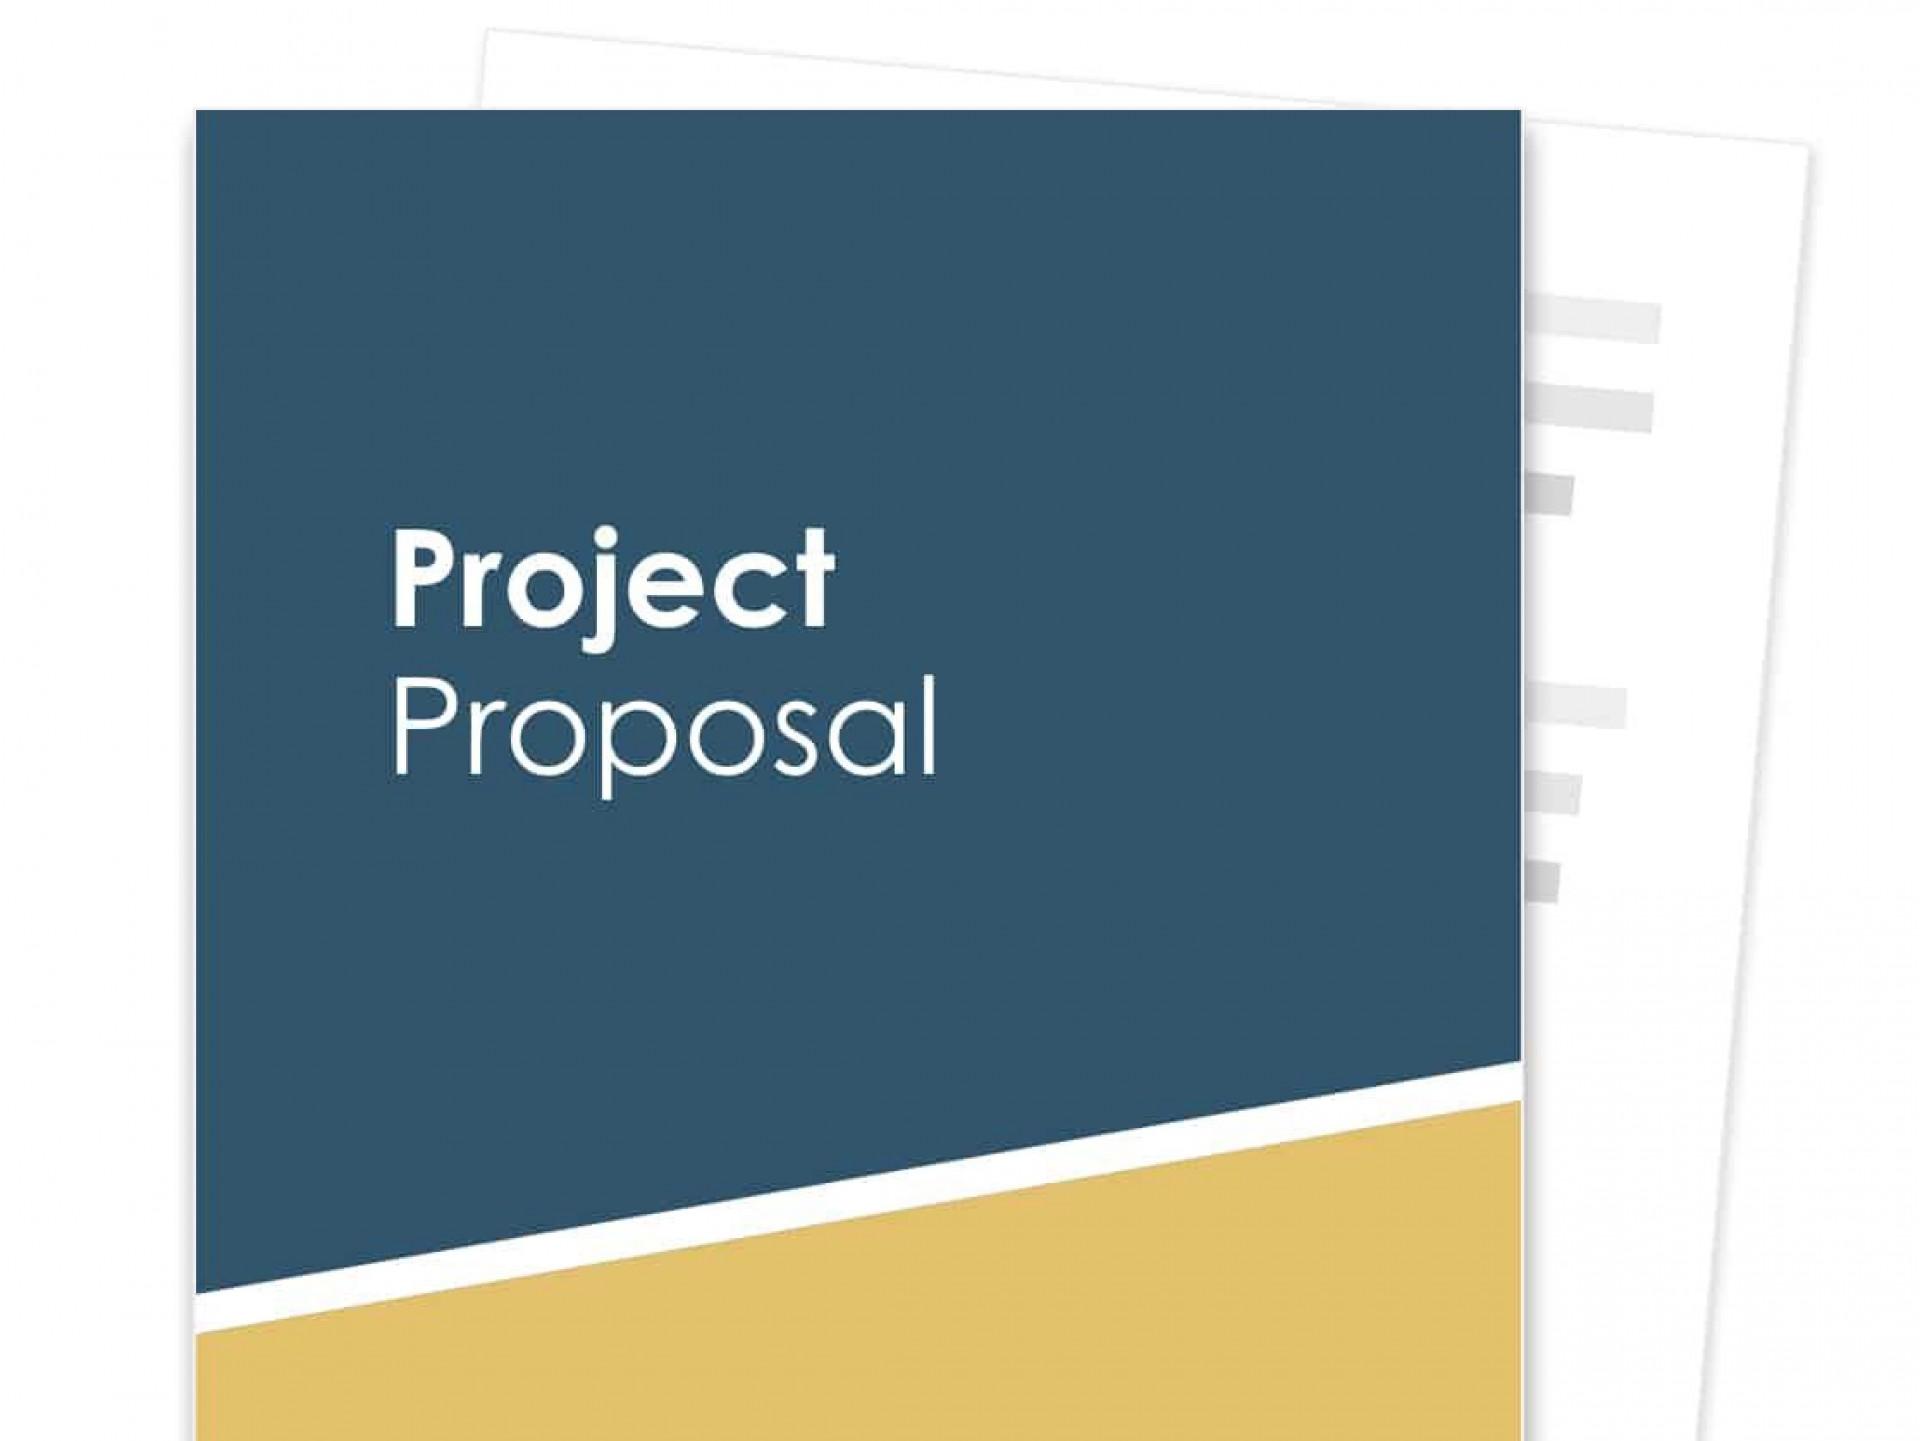 007 Fantastic Web Design Proposal Template Free Download High Resolution 1920